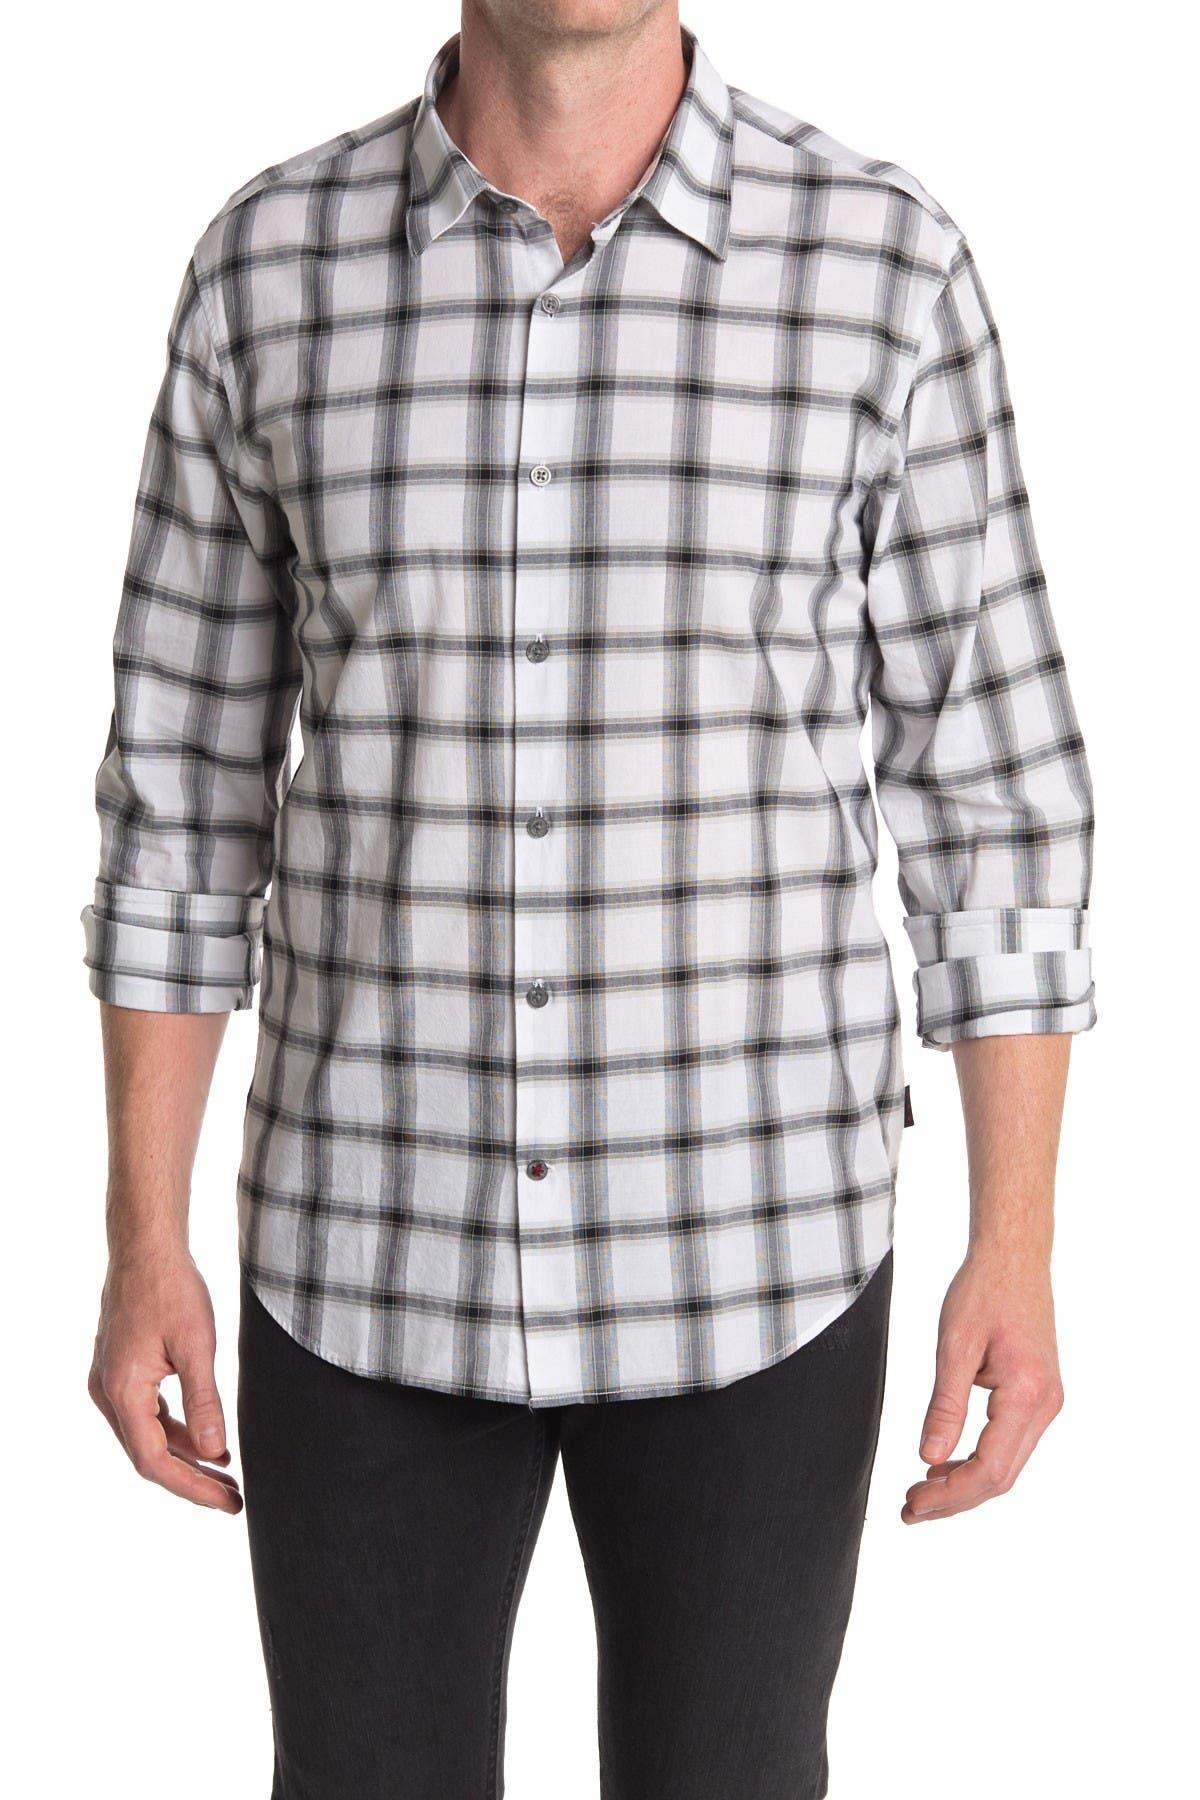 Image of John Varvatos Collection Long Sleeve Checkered Woven Shirt